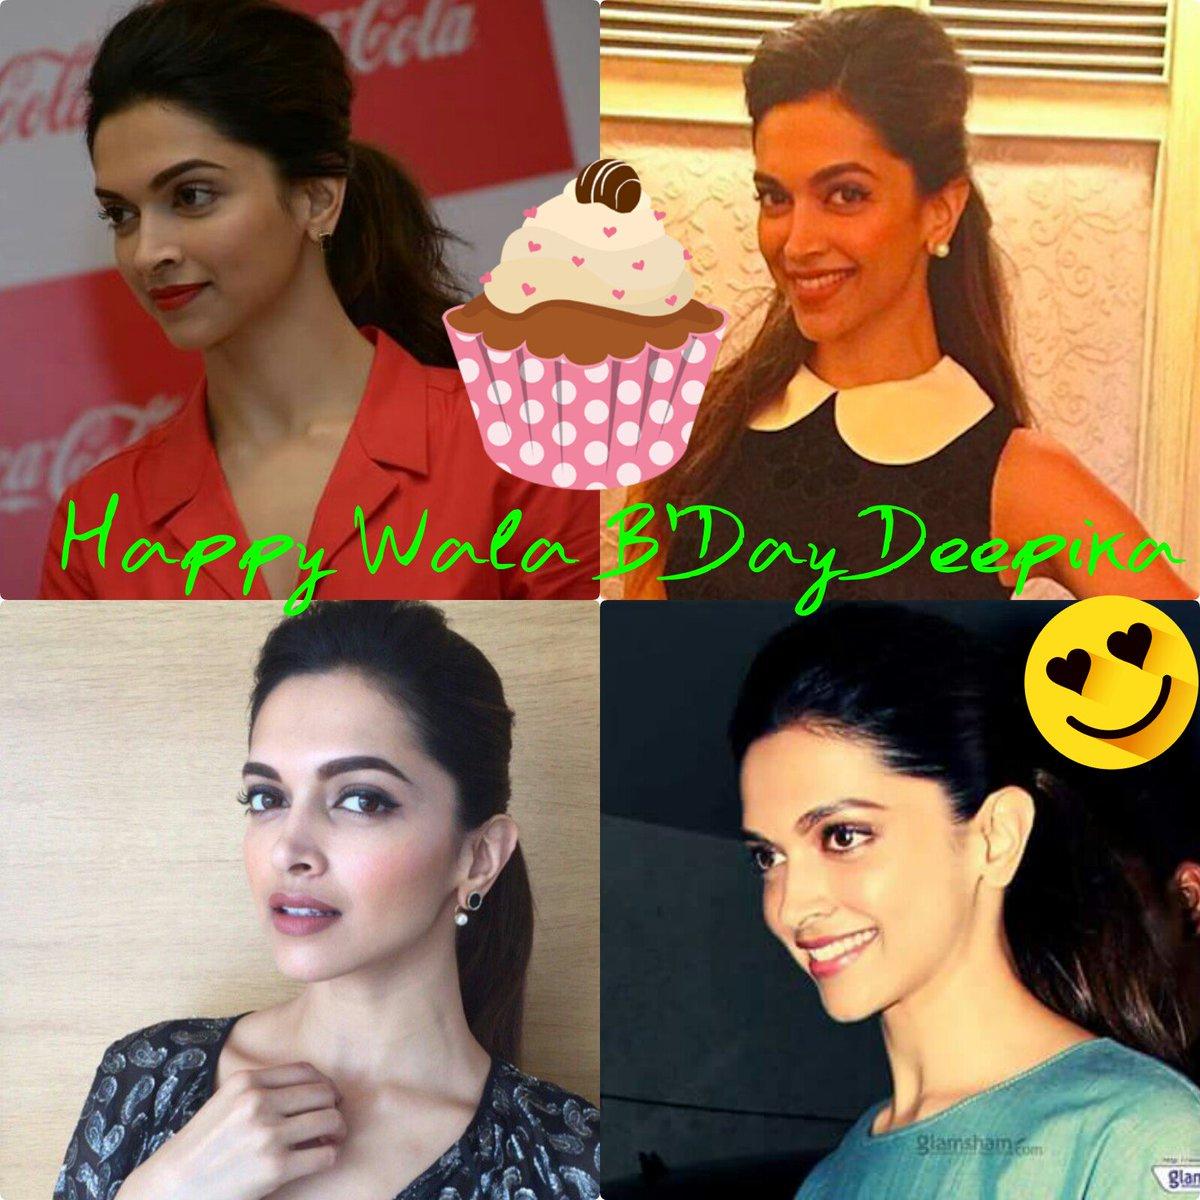 Happy vala birthday Deepu 😍😍😍😘😘💜💜💜🎉🎉🎊🎉🎊🎉🎊🎇🎇🎇 #HappyBirthdayDeepikaPadukone